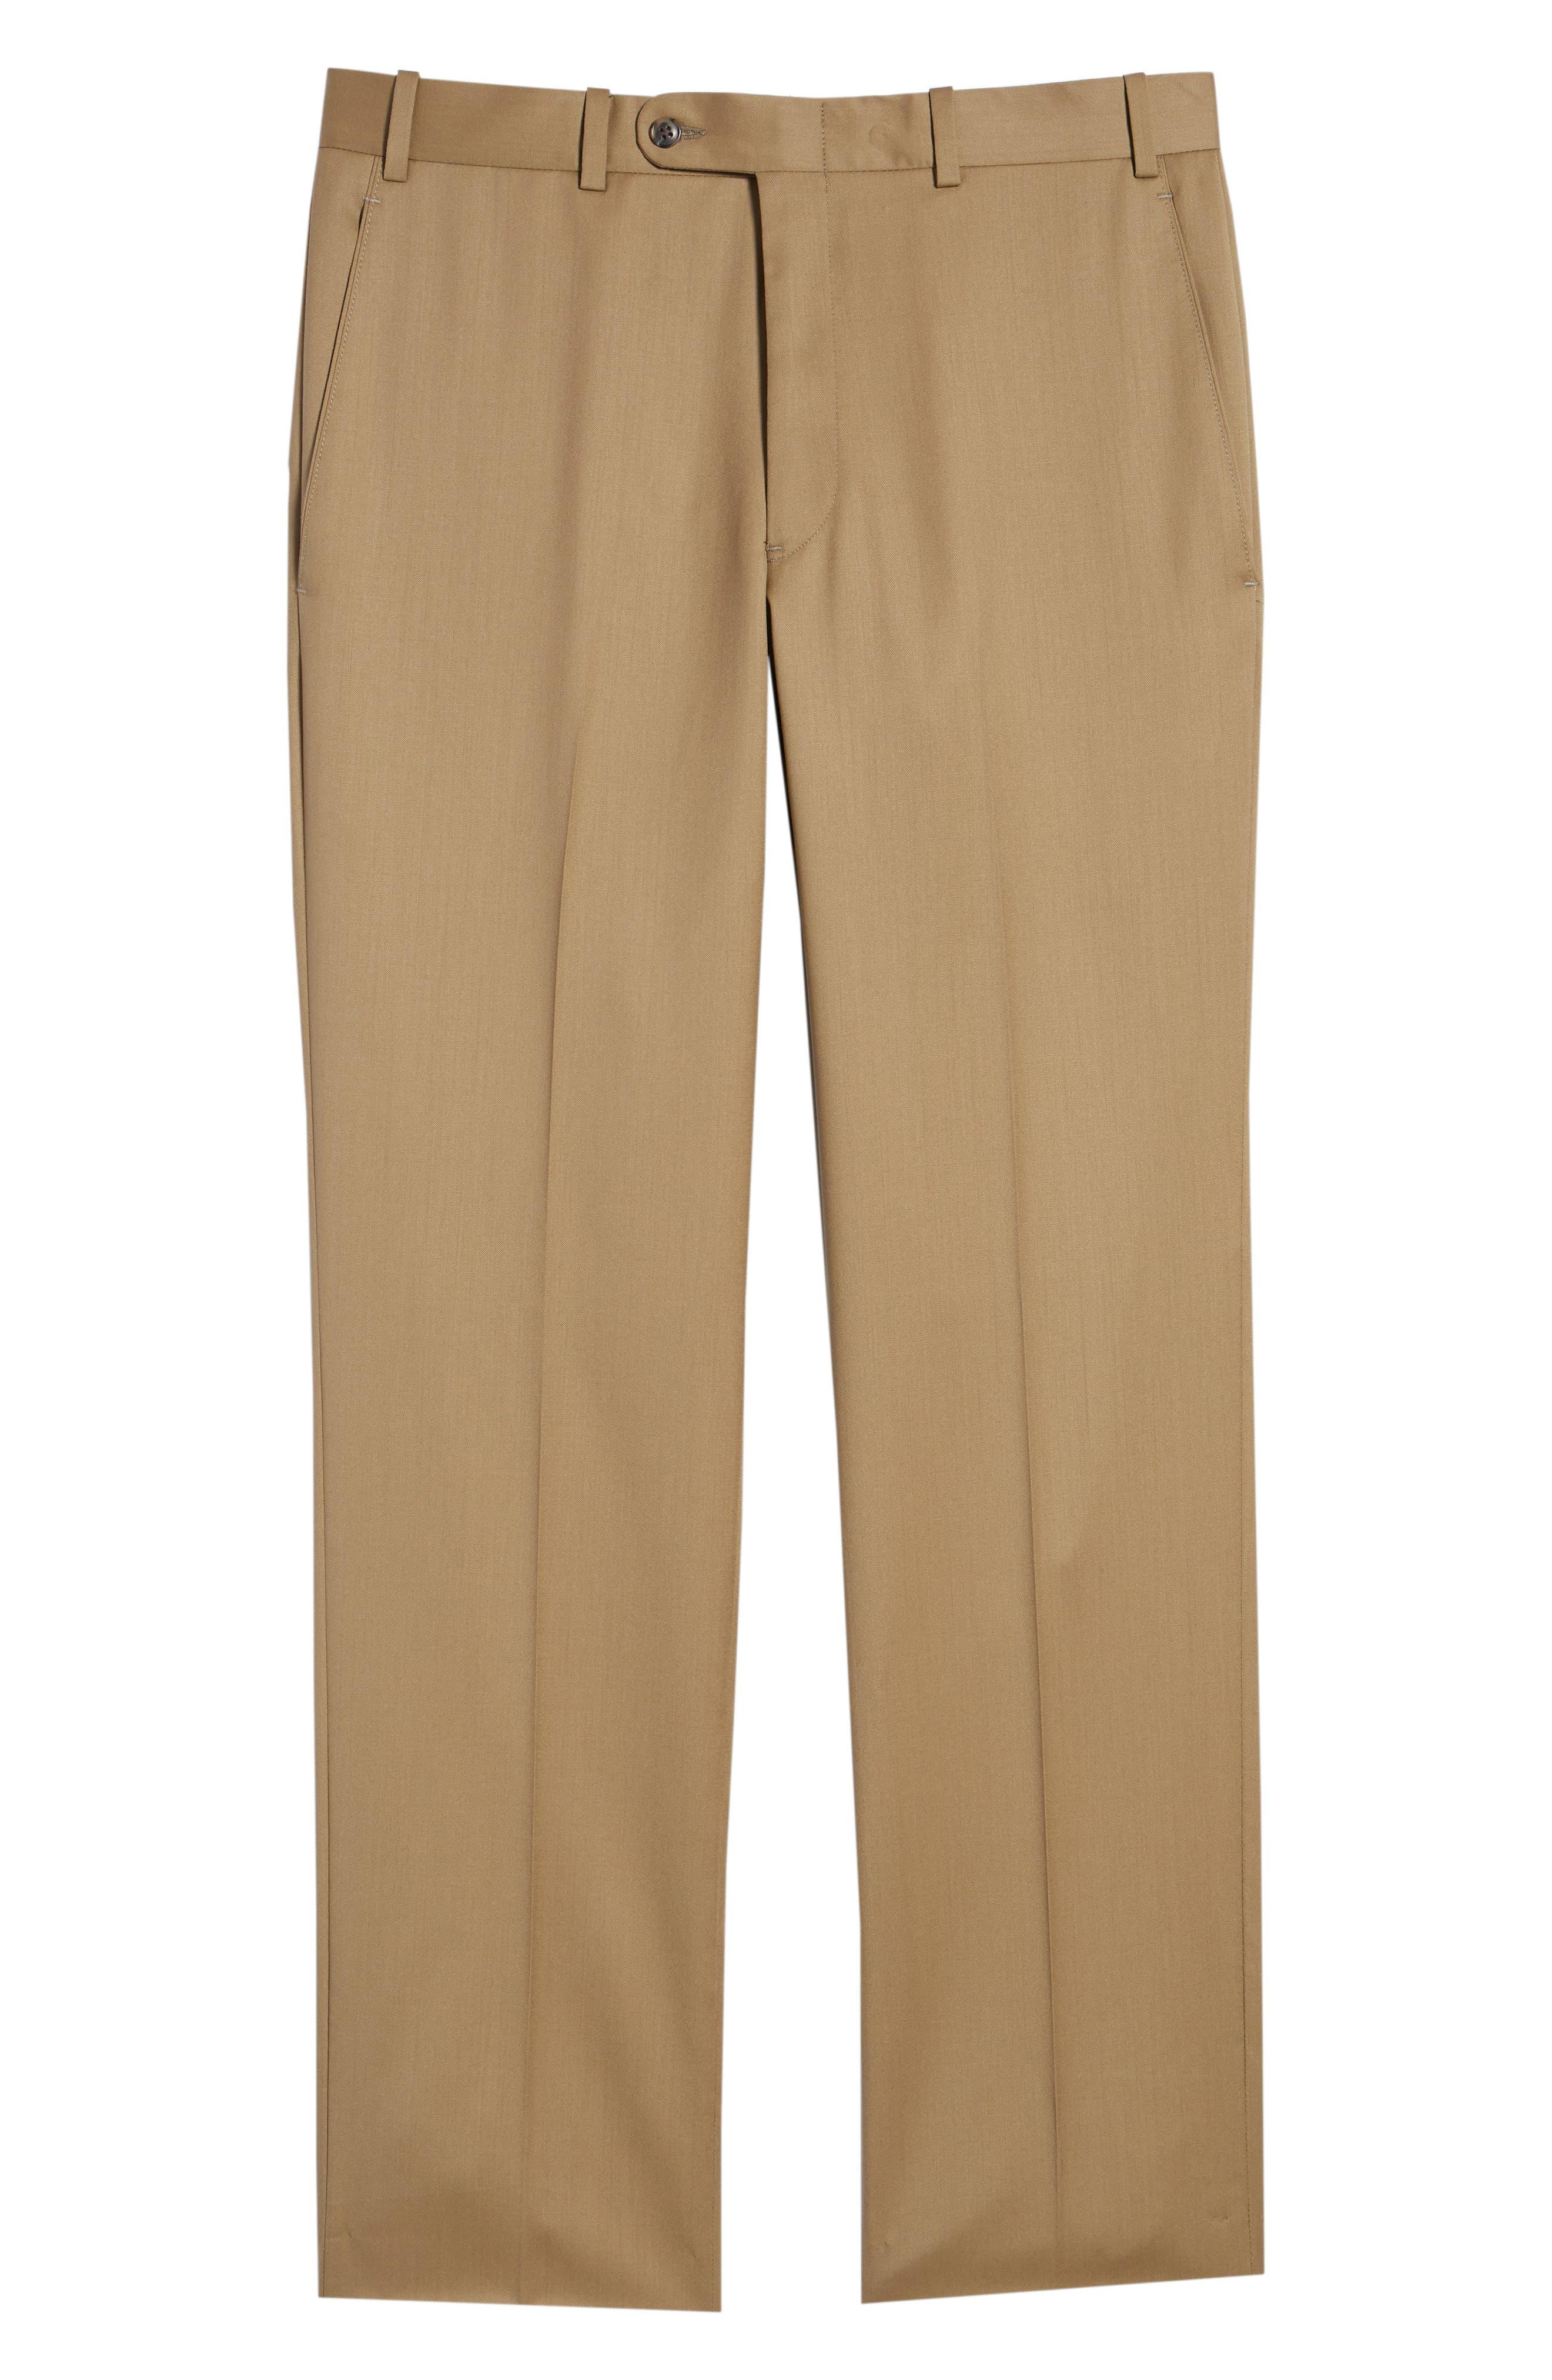 Torino Flat Front Wool Gabardine Trousers,                             Alternate thumbnail 34, color,